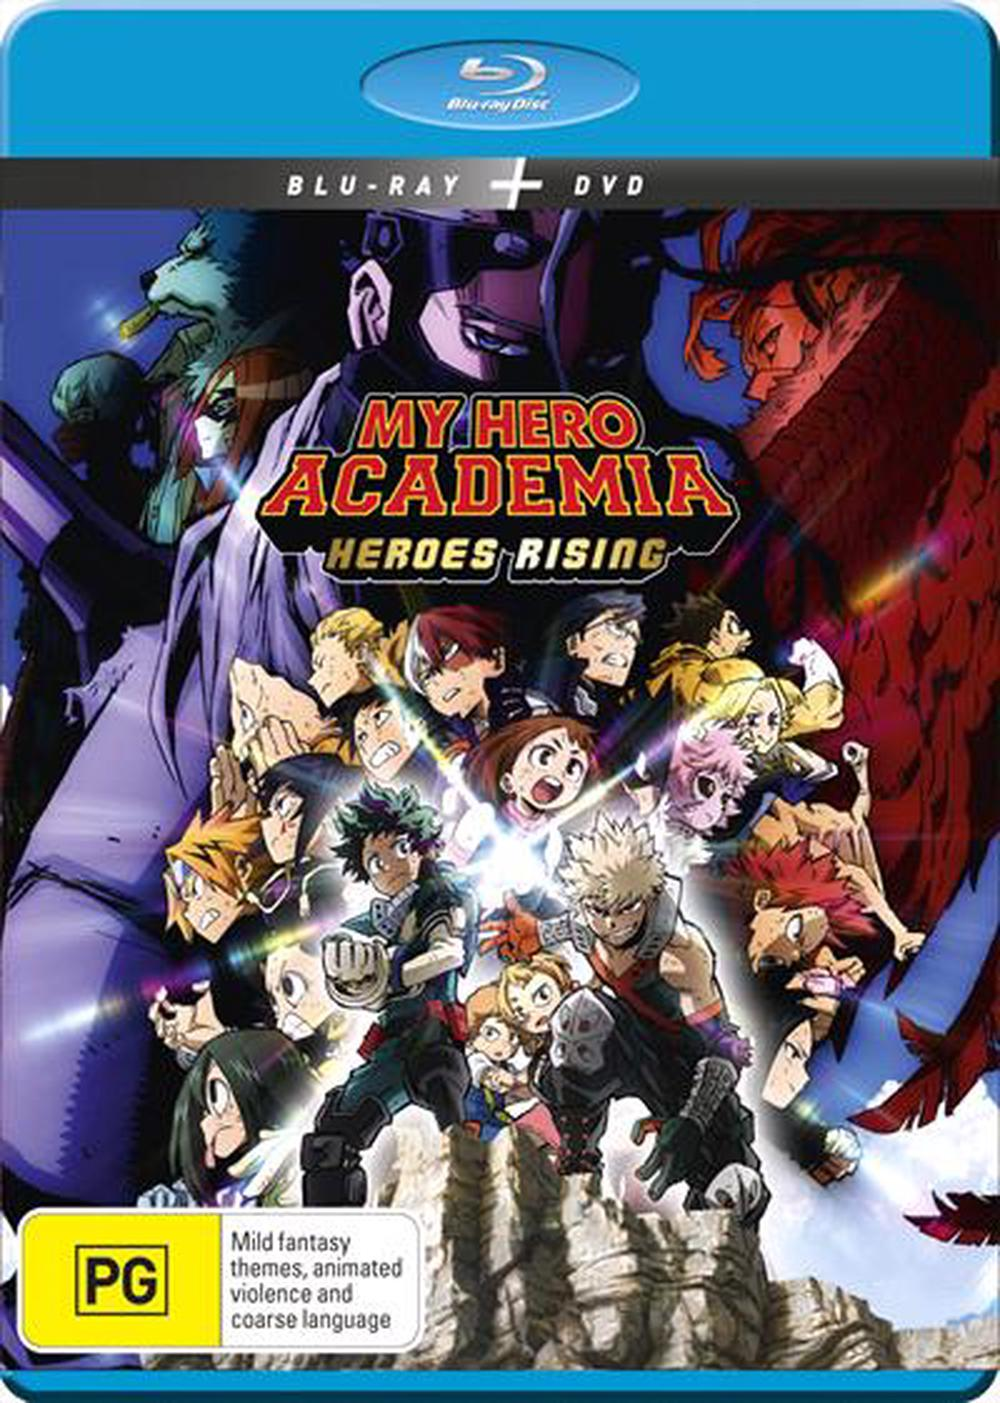 My Hero Academia The Movie - Heroes Rising | Blu-ray + DVD